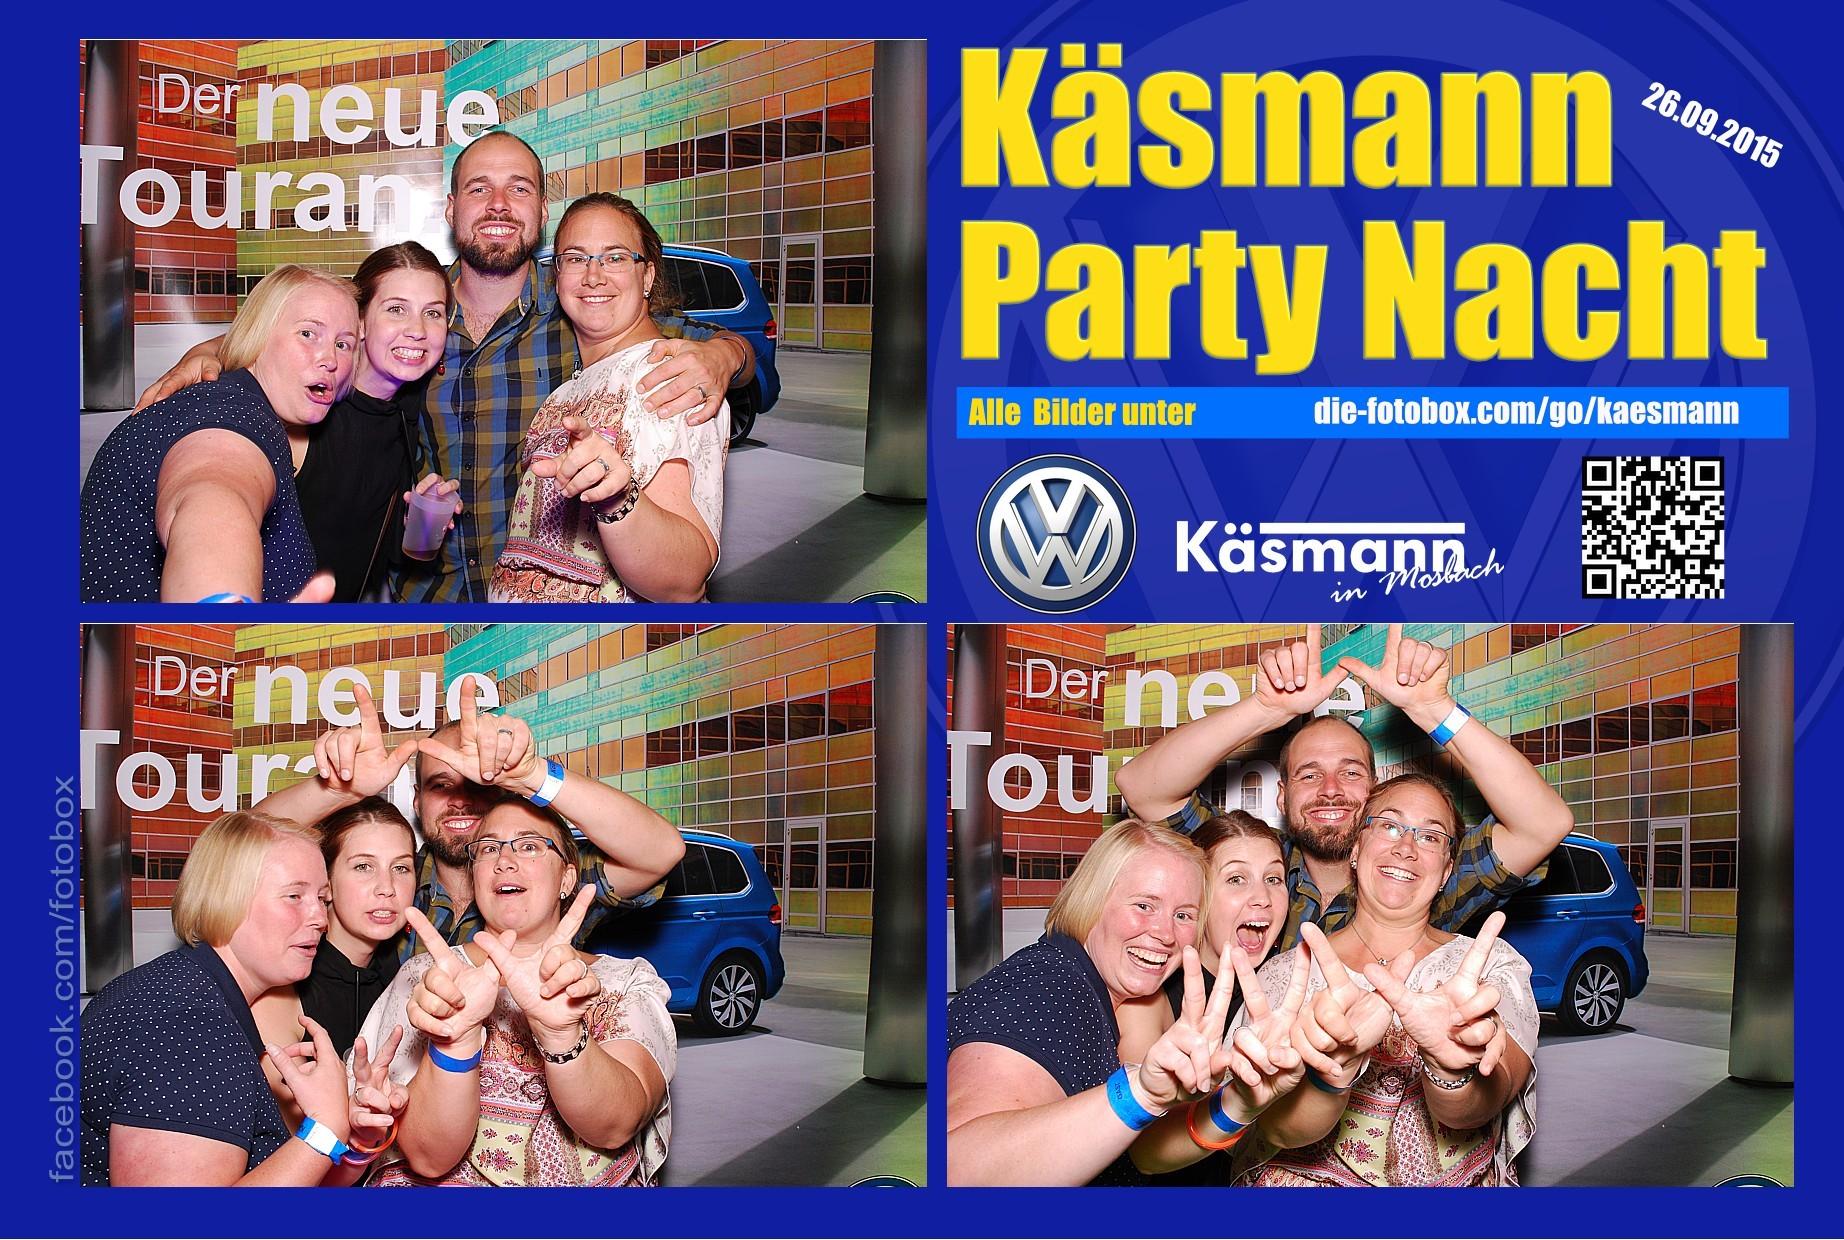 Käsmannparty 2015 - www.die-fotobox.com 01112